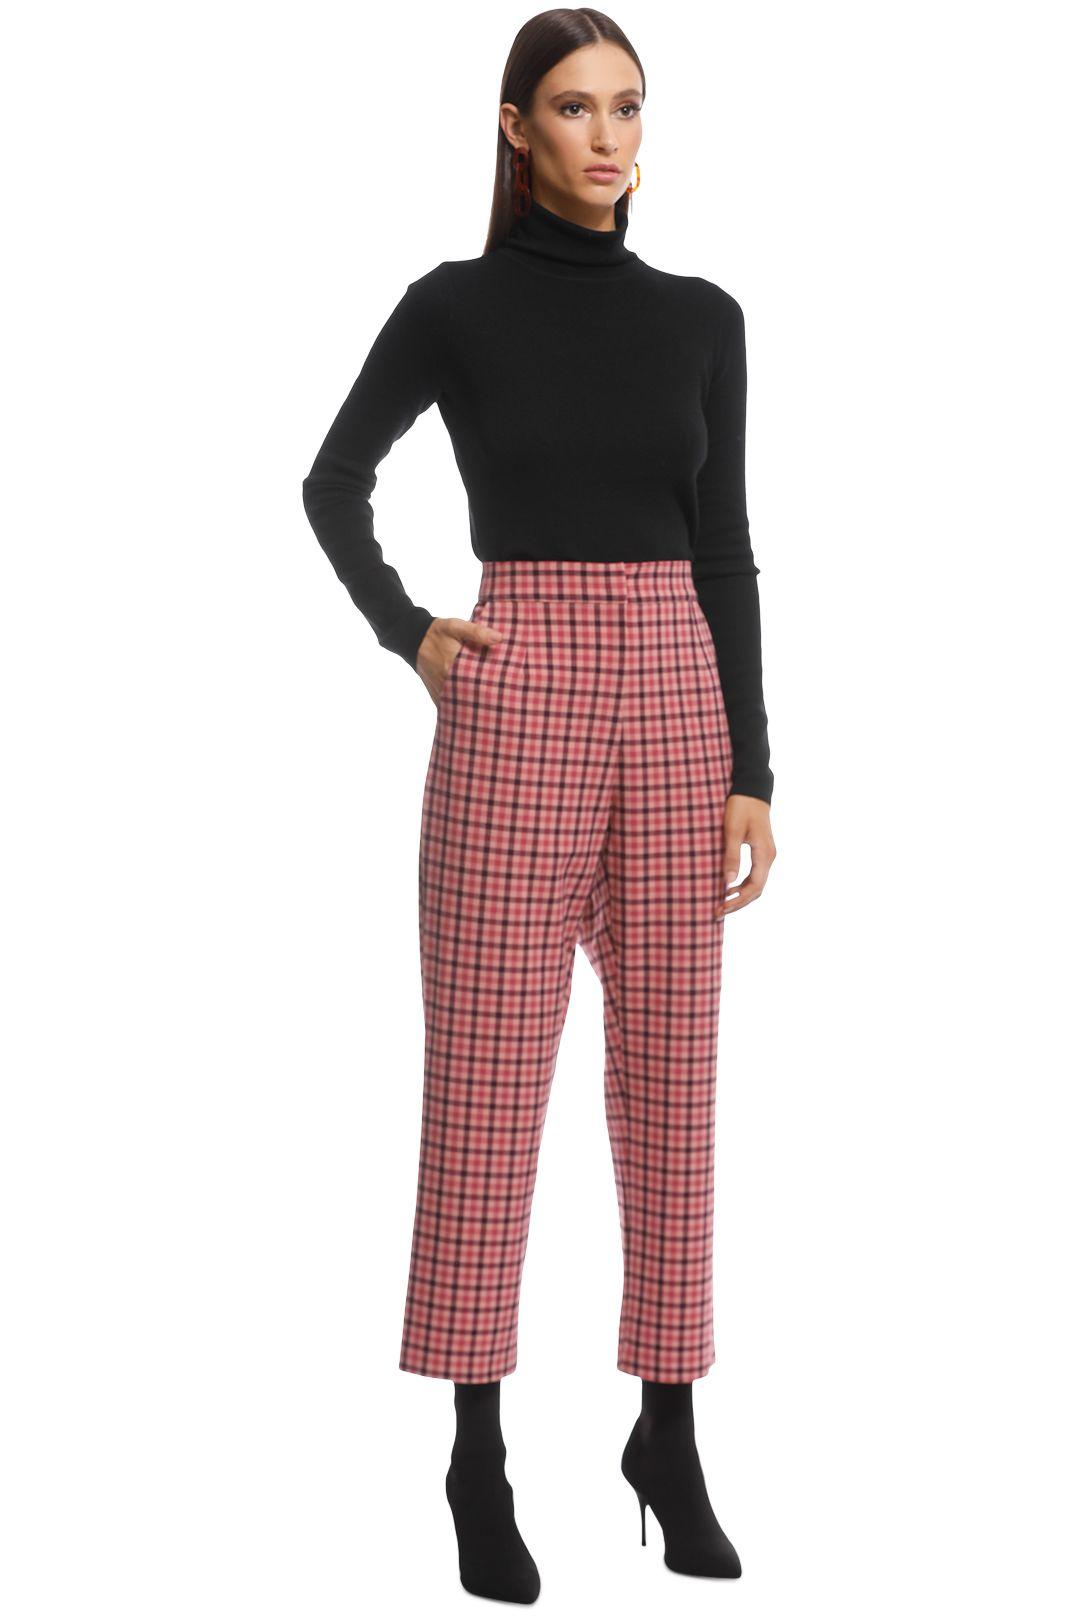 Pasduchas - Ravel Trousers - Pink - Side